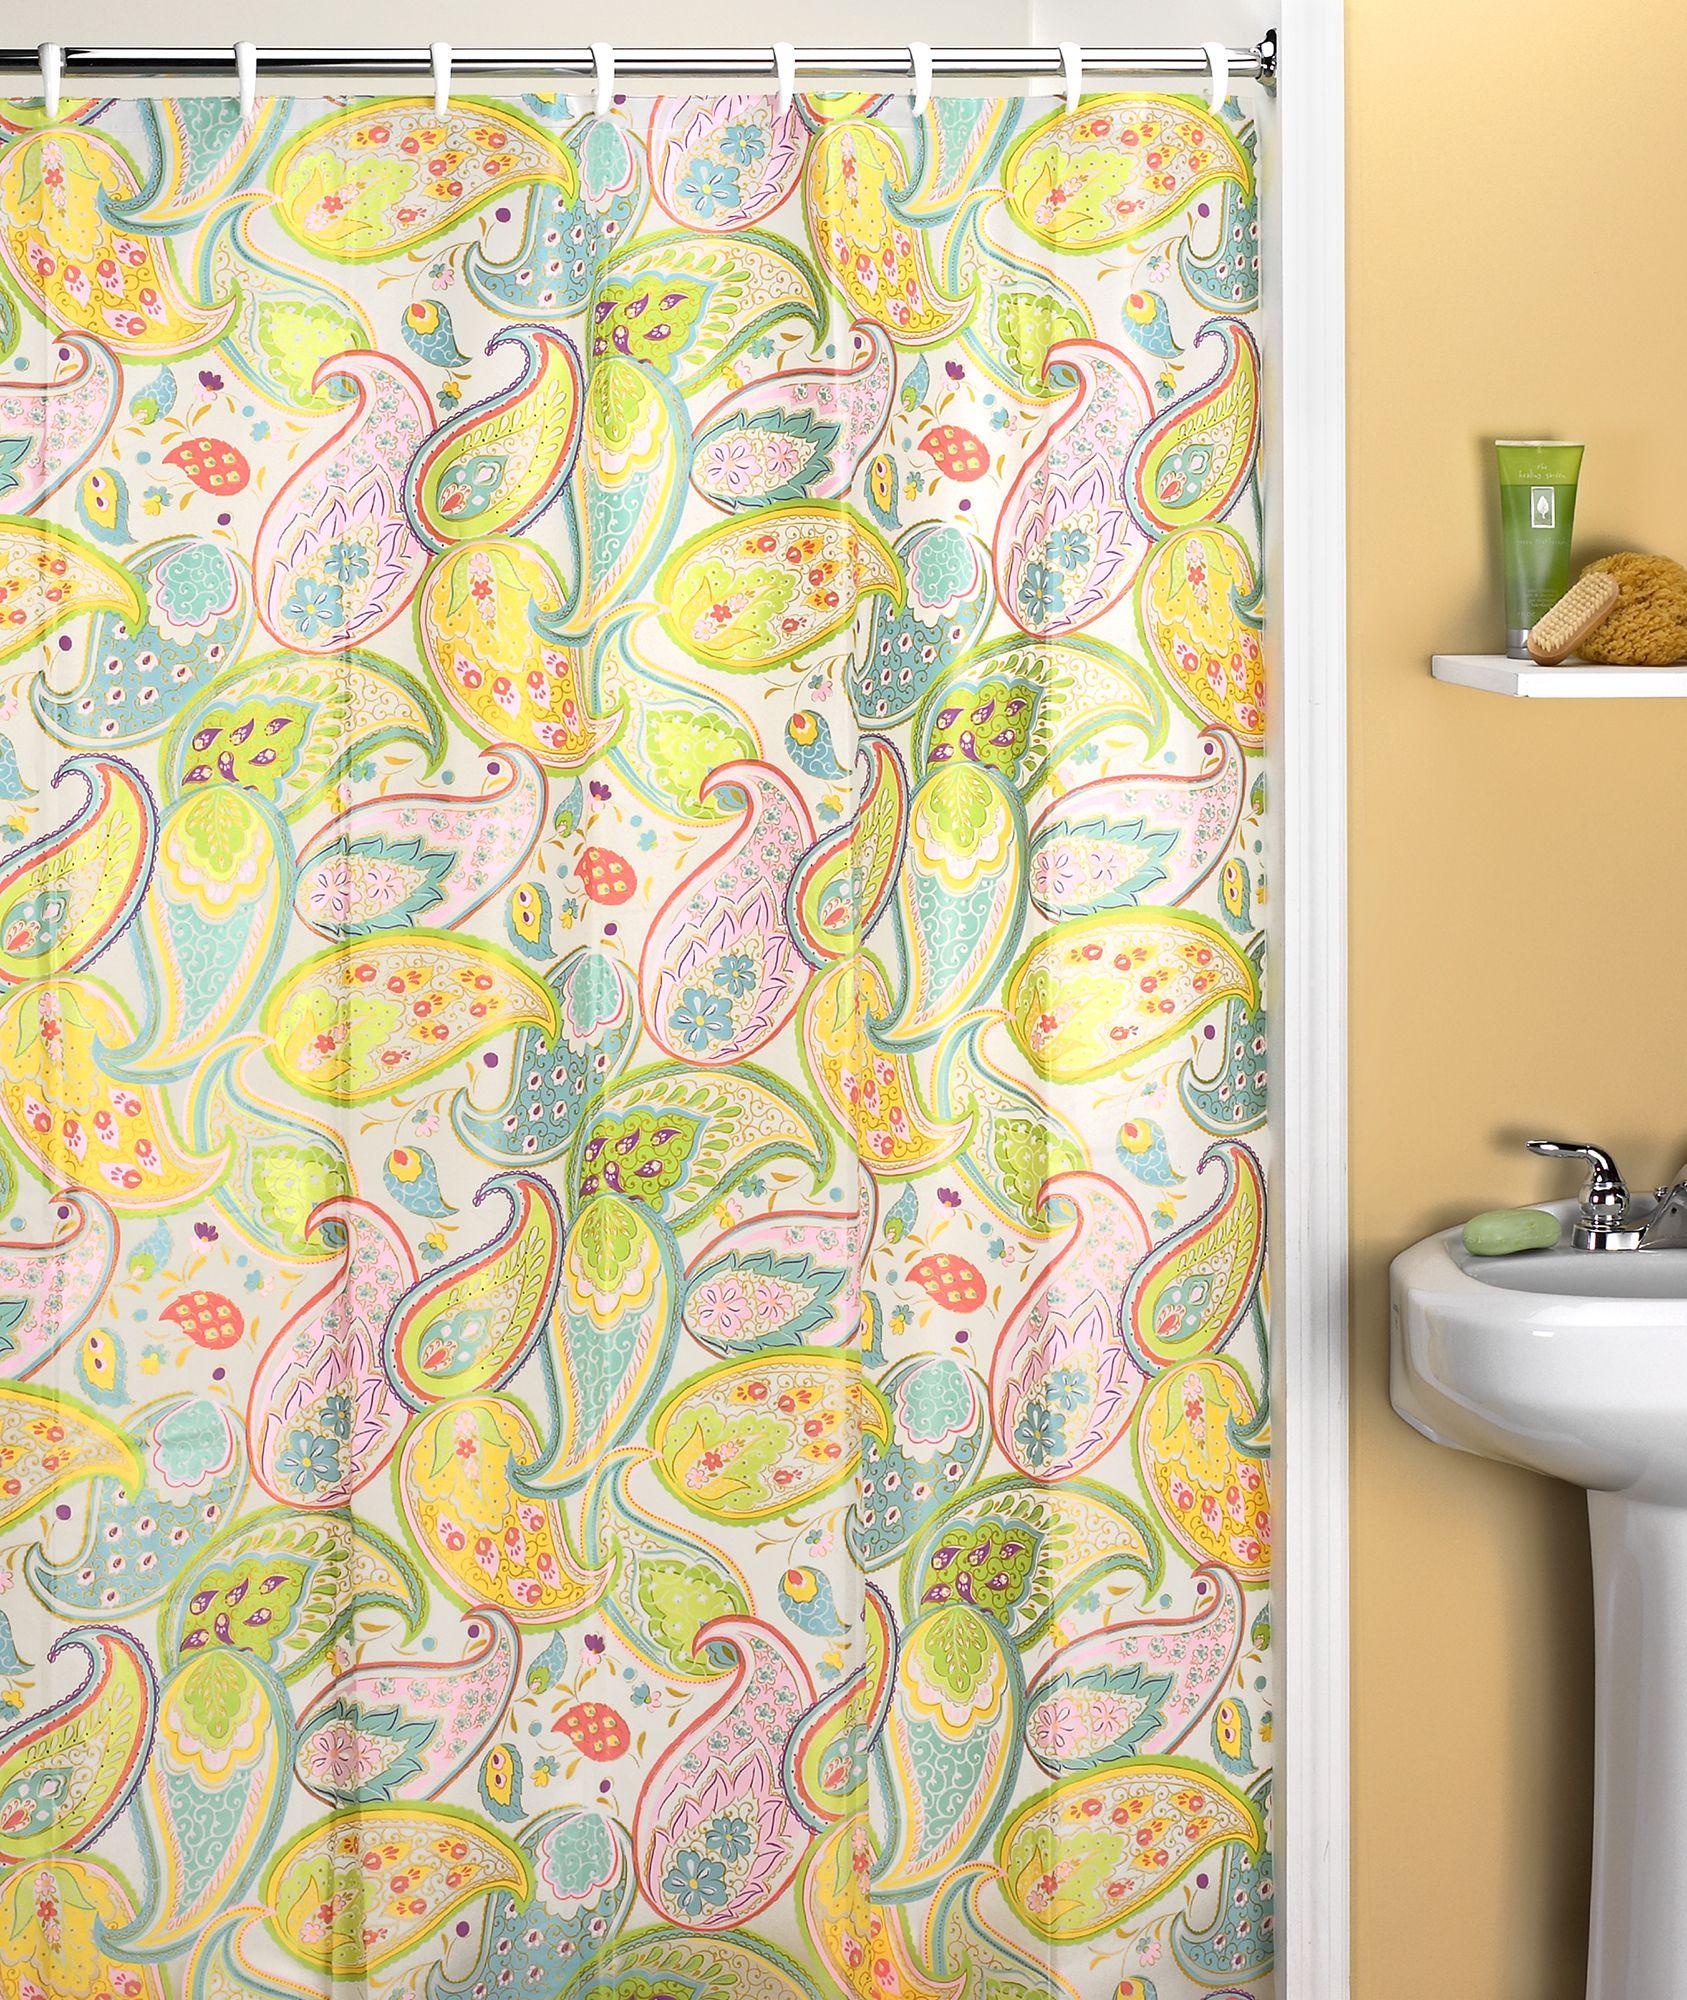 Ba bathroom curtains at sears - Creative Bath Cool Paisley Shower Curtain Multi